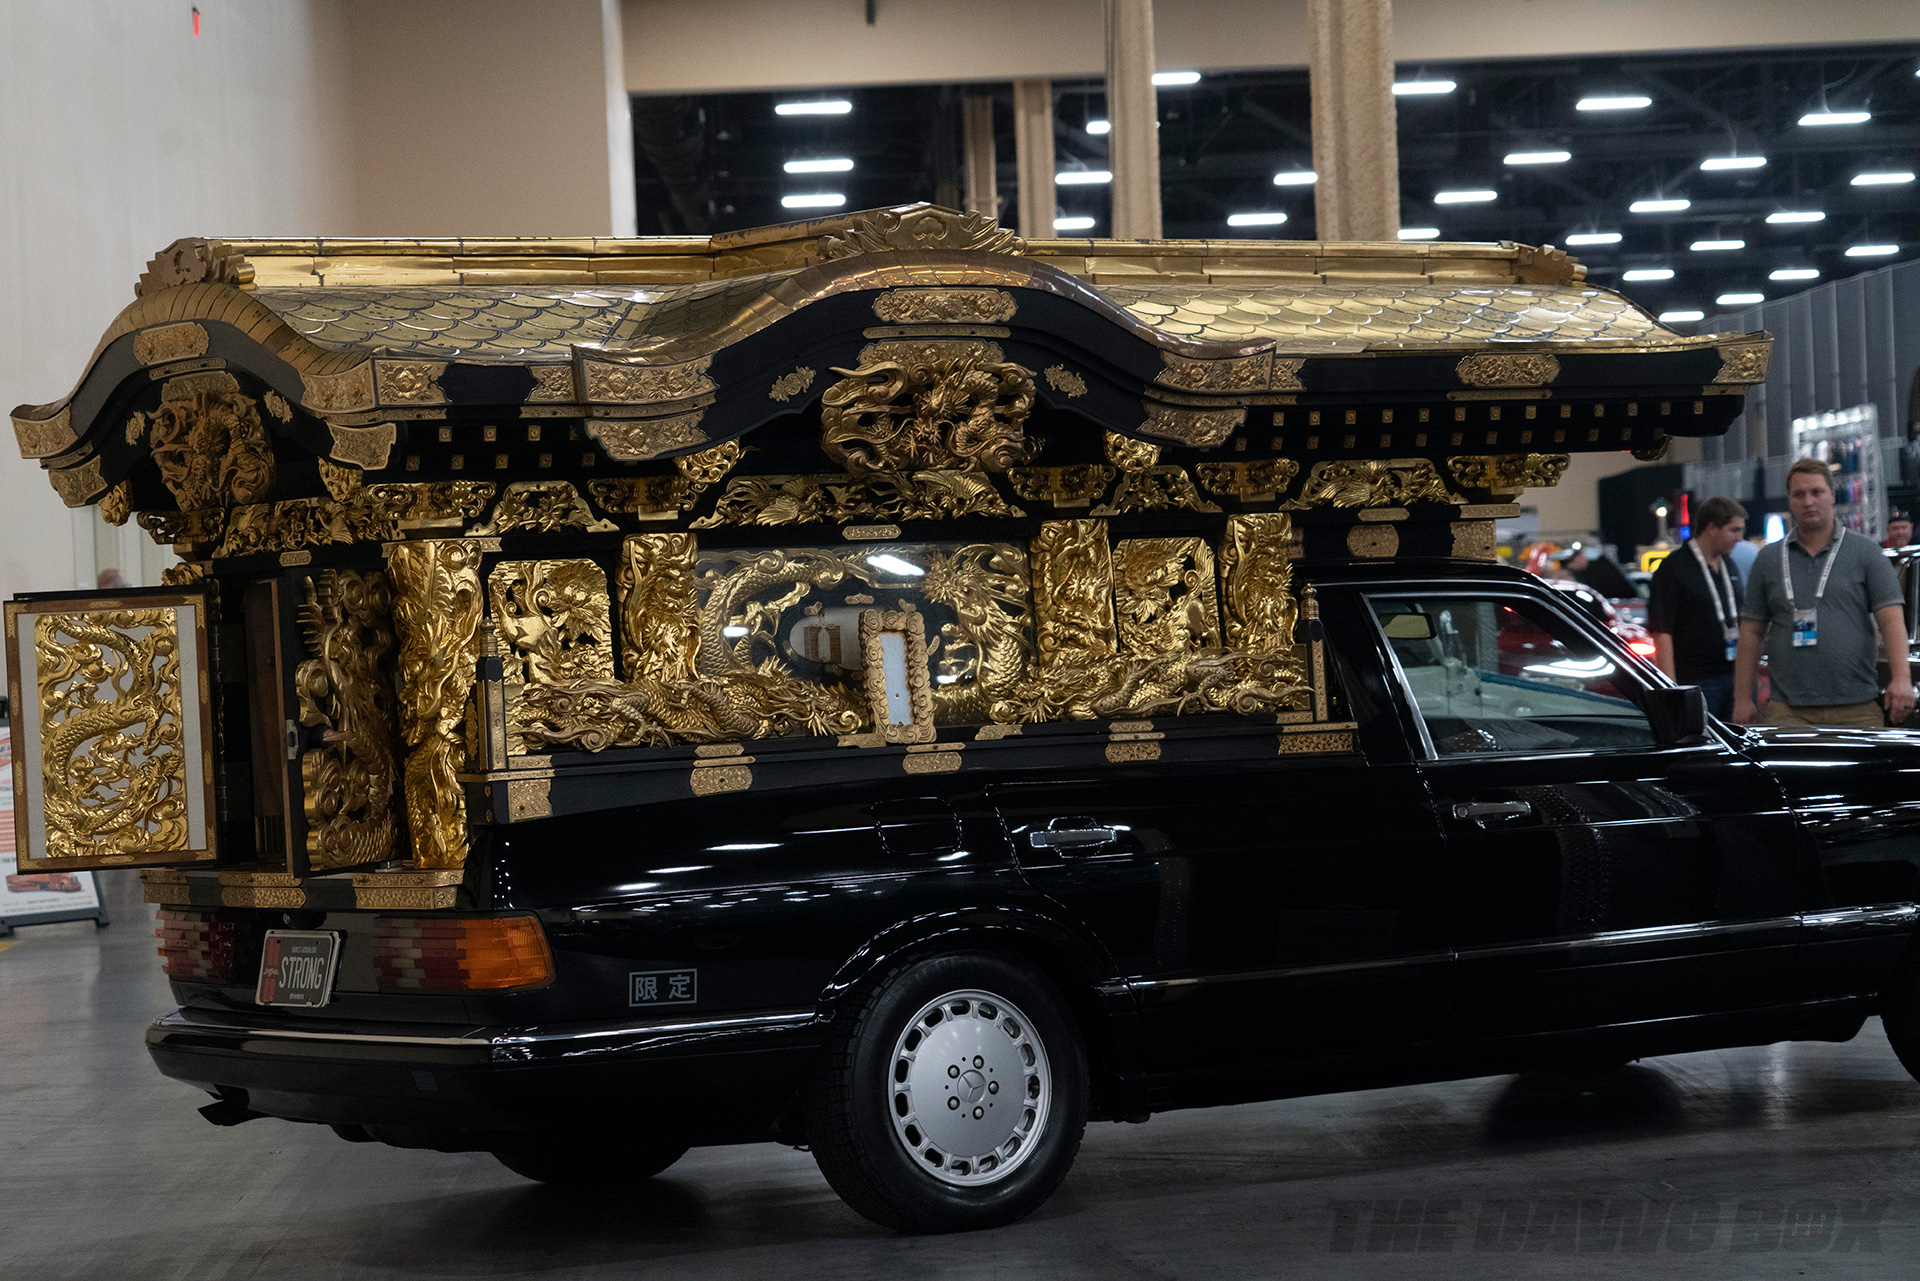 black 1990 Mercedes-Benz 560 SEL 'Nagoya' Hearse at Barrett-Jackson Auction